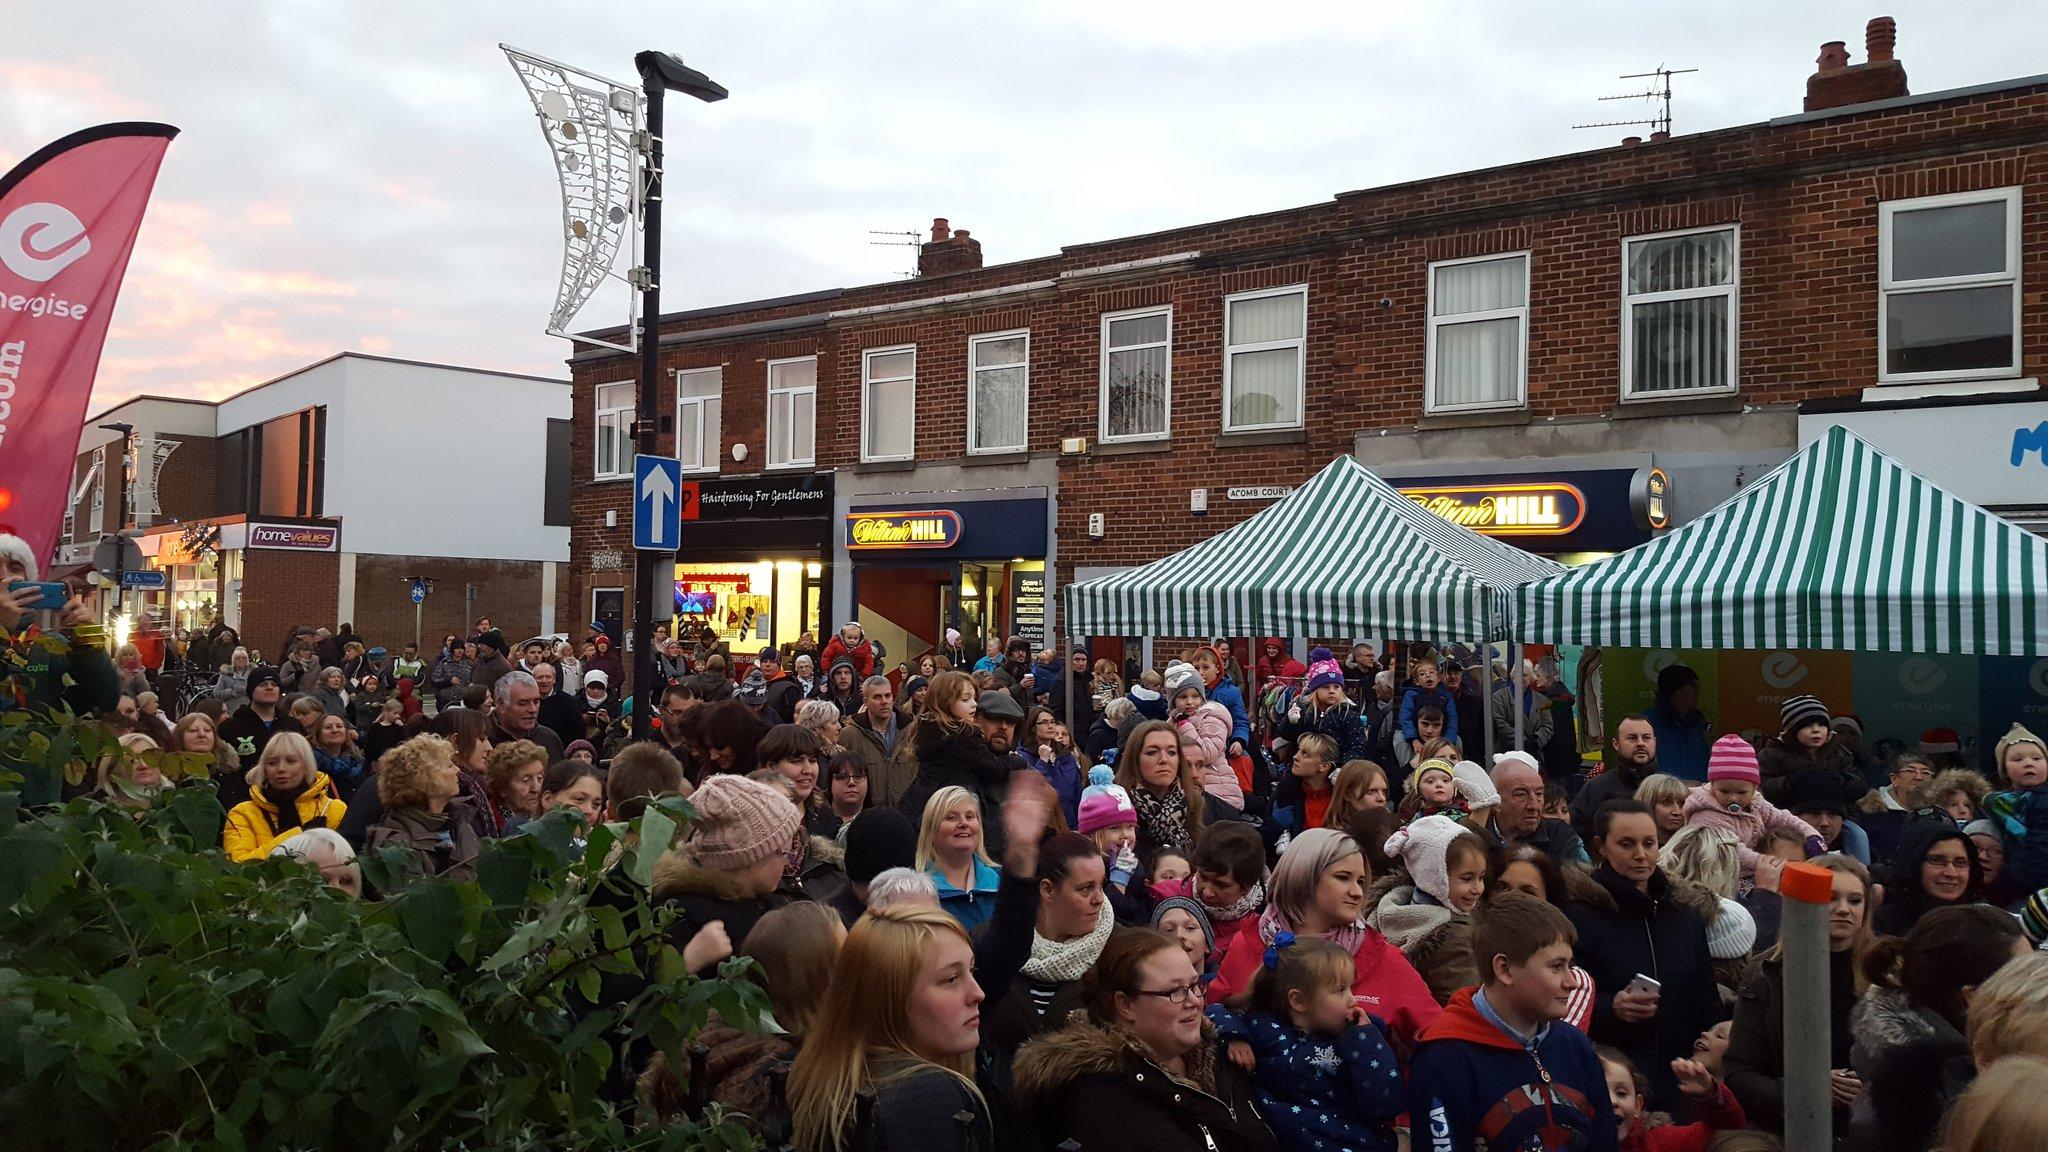 Crowds getting bigger